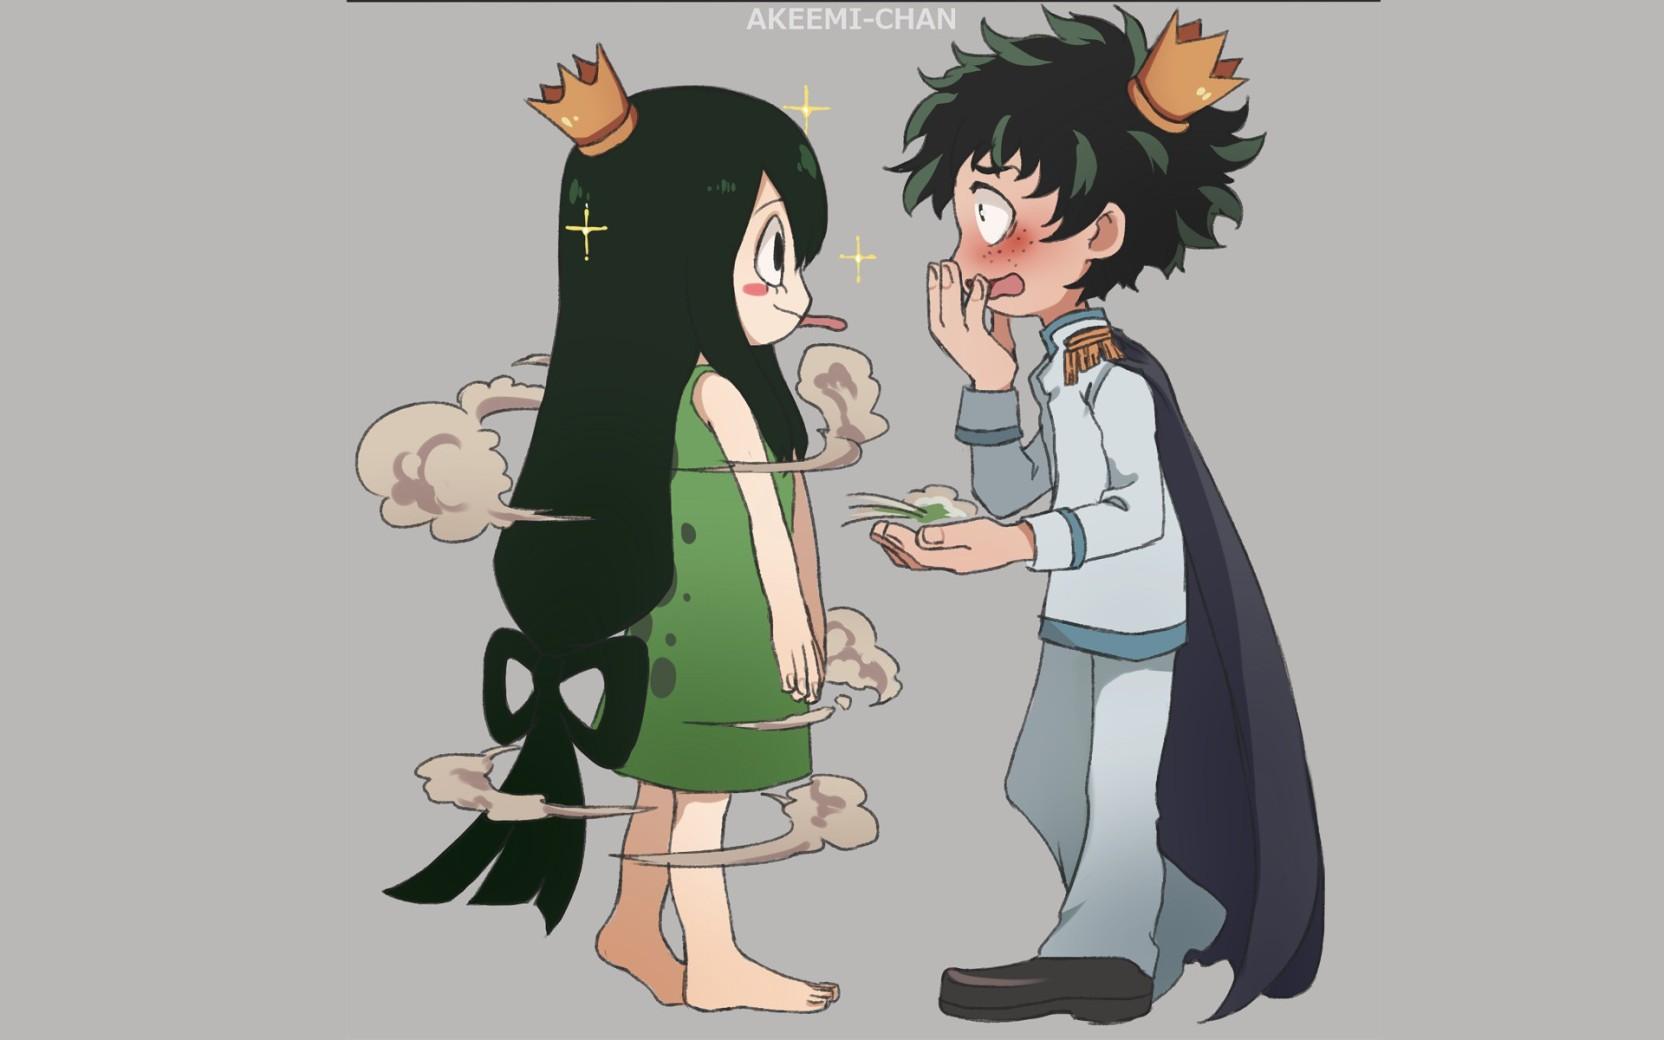 Athah Anime My Hero Academia Izuku Midoriya Tsuyu Asui 13 19